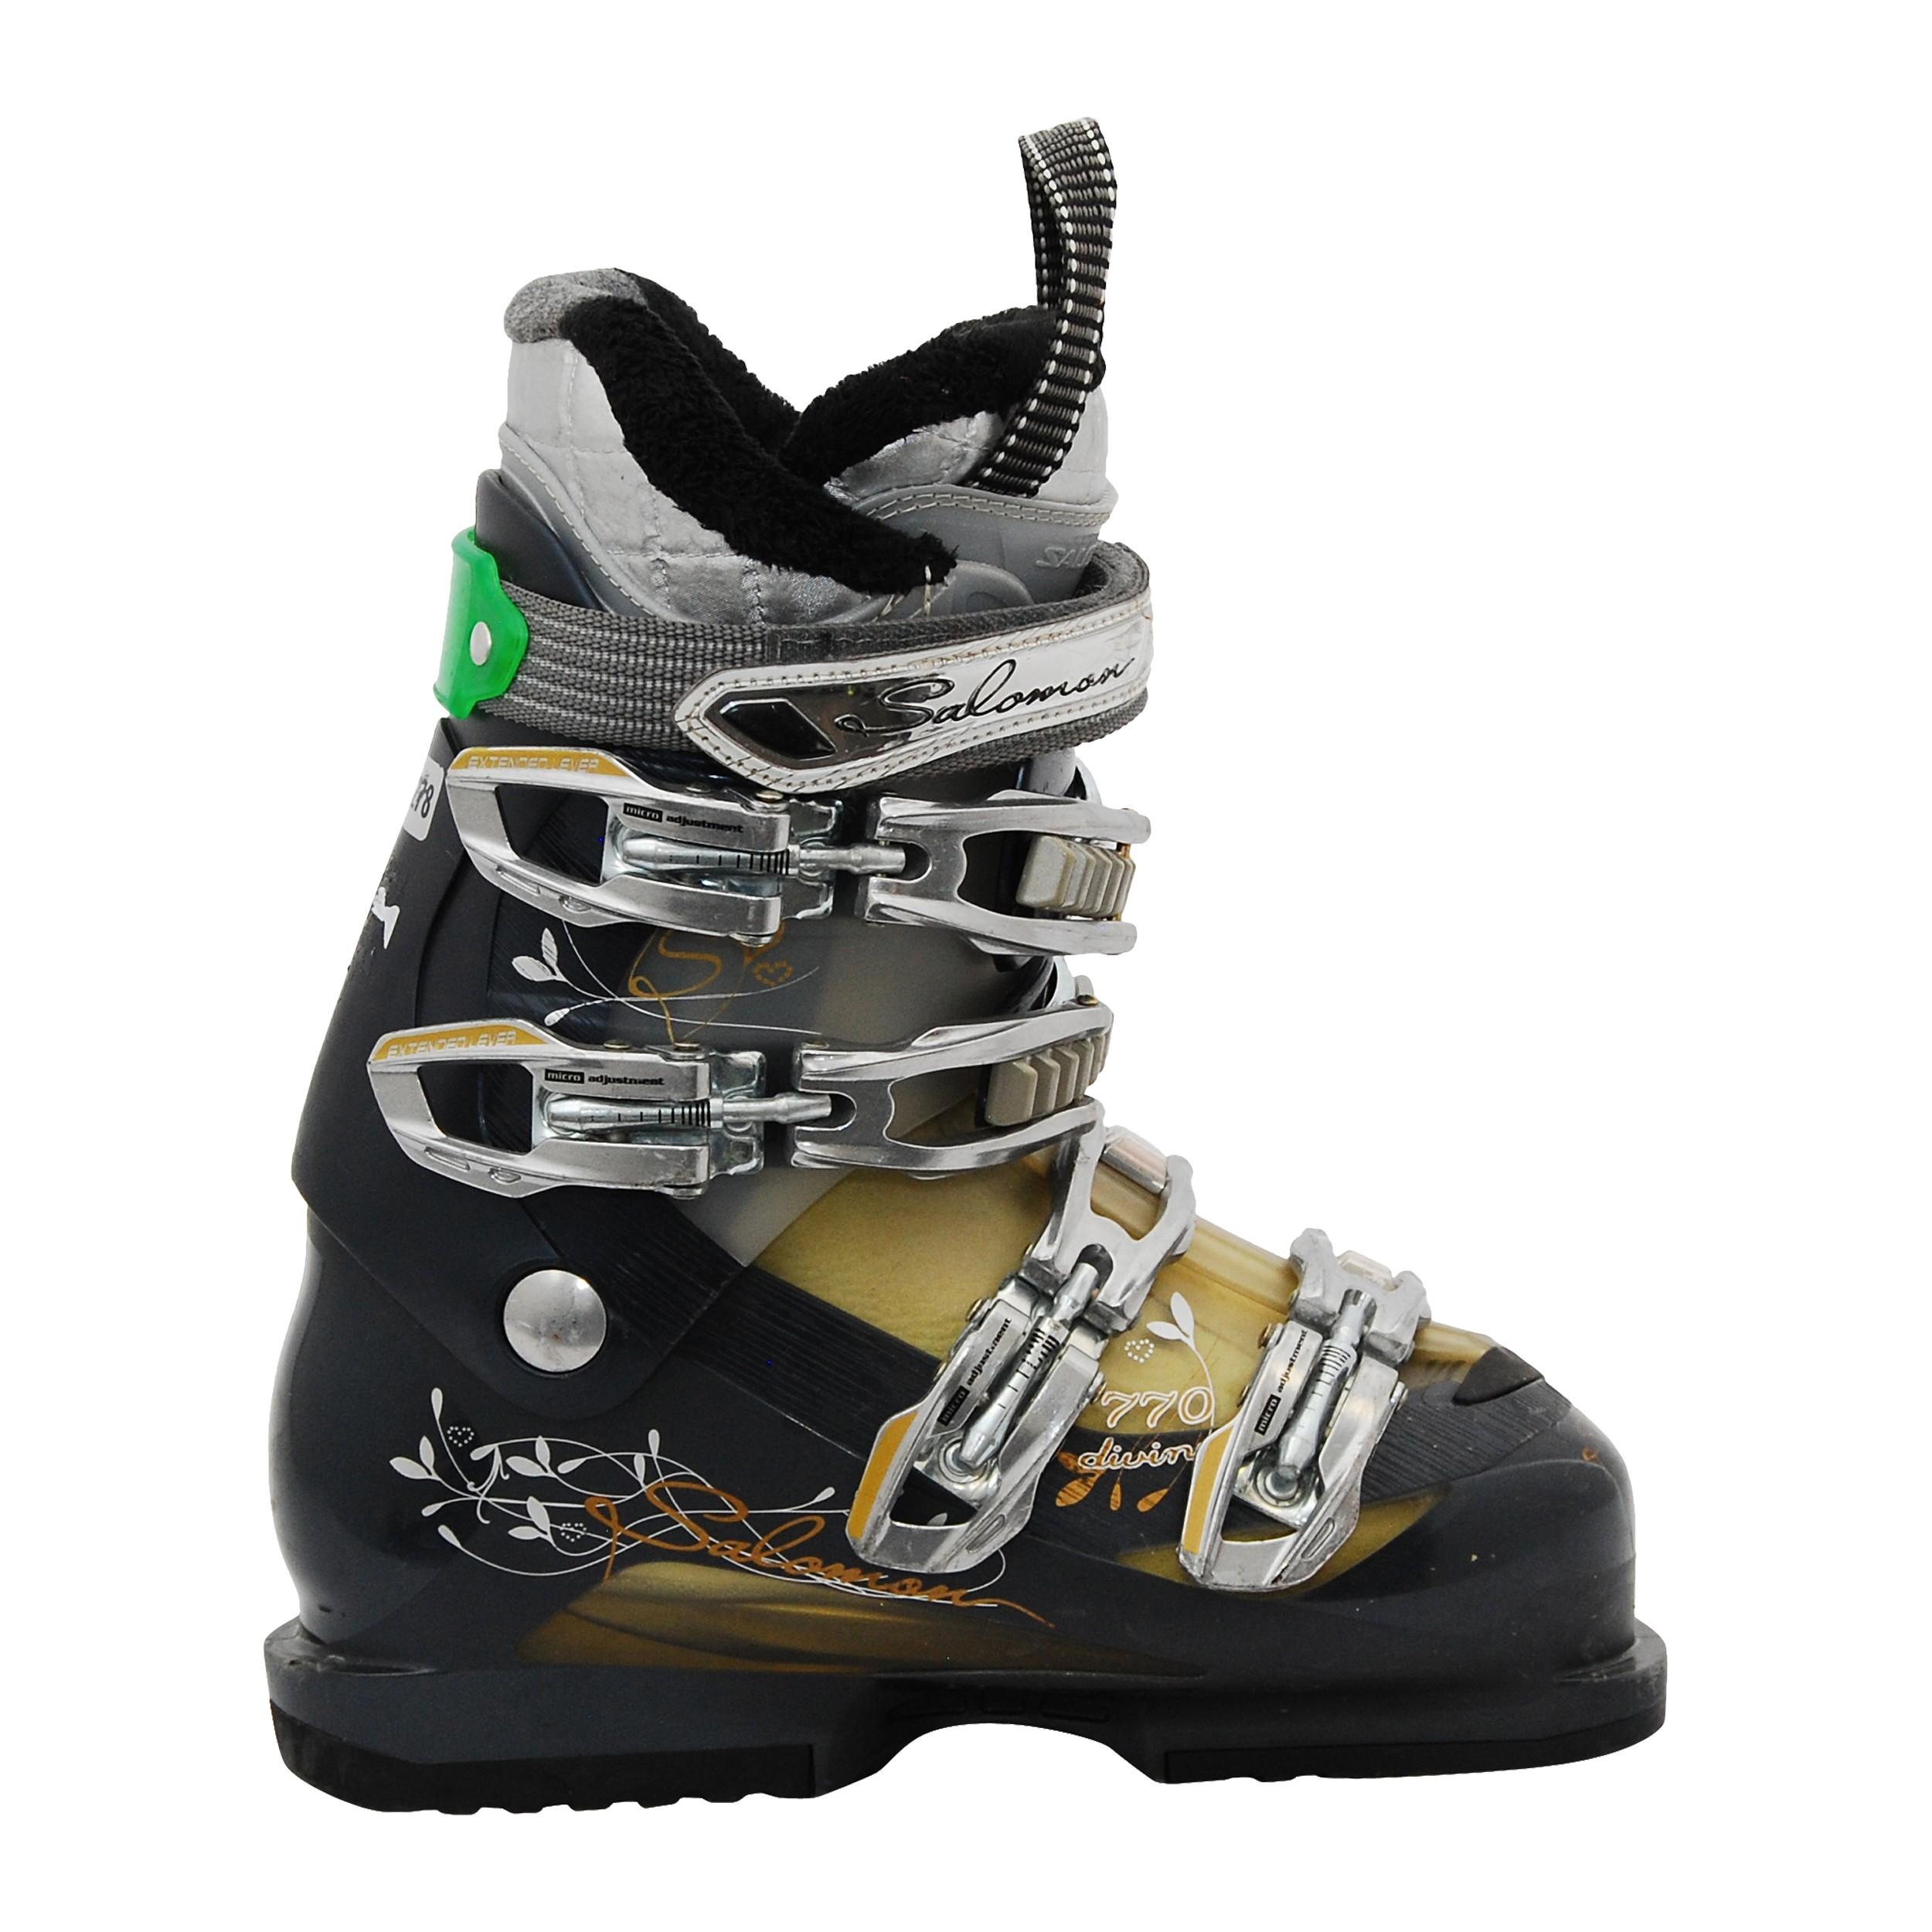 Salomon Women's Divine 770 Ski Boots